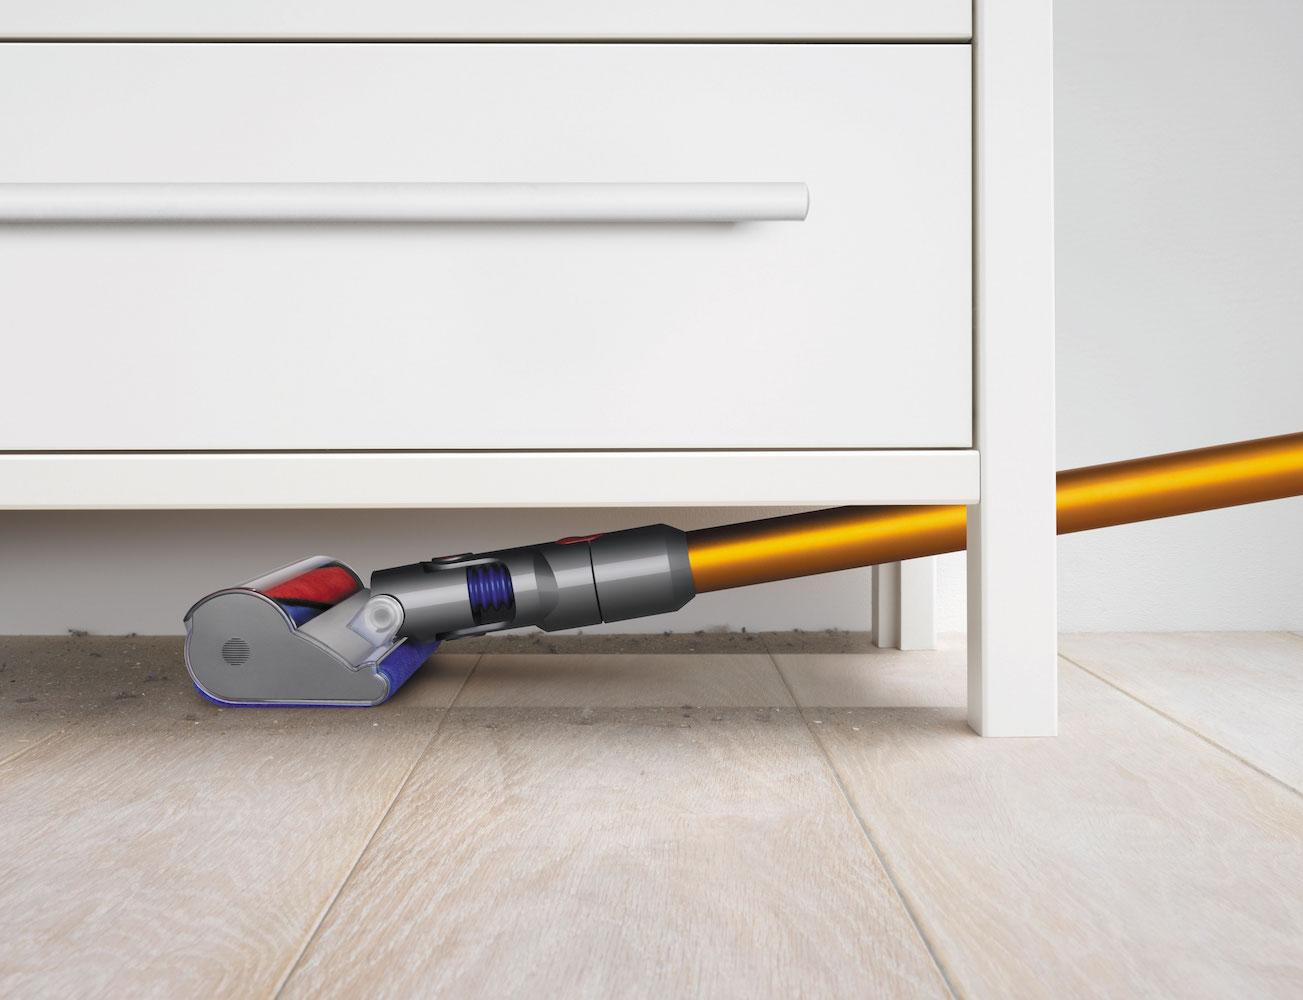 dyson v8 cordless vacuum review the gadget flow. Black Bedroom Furniture Sets. Home Design Ideas